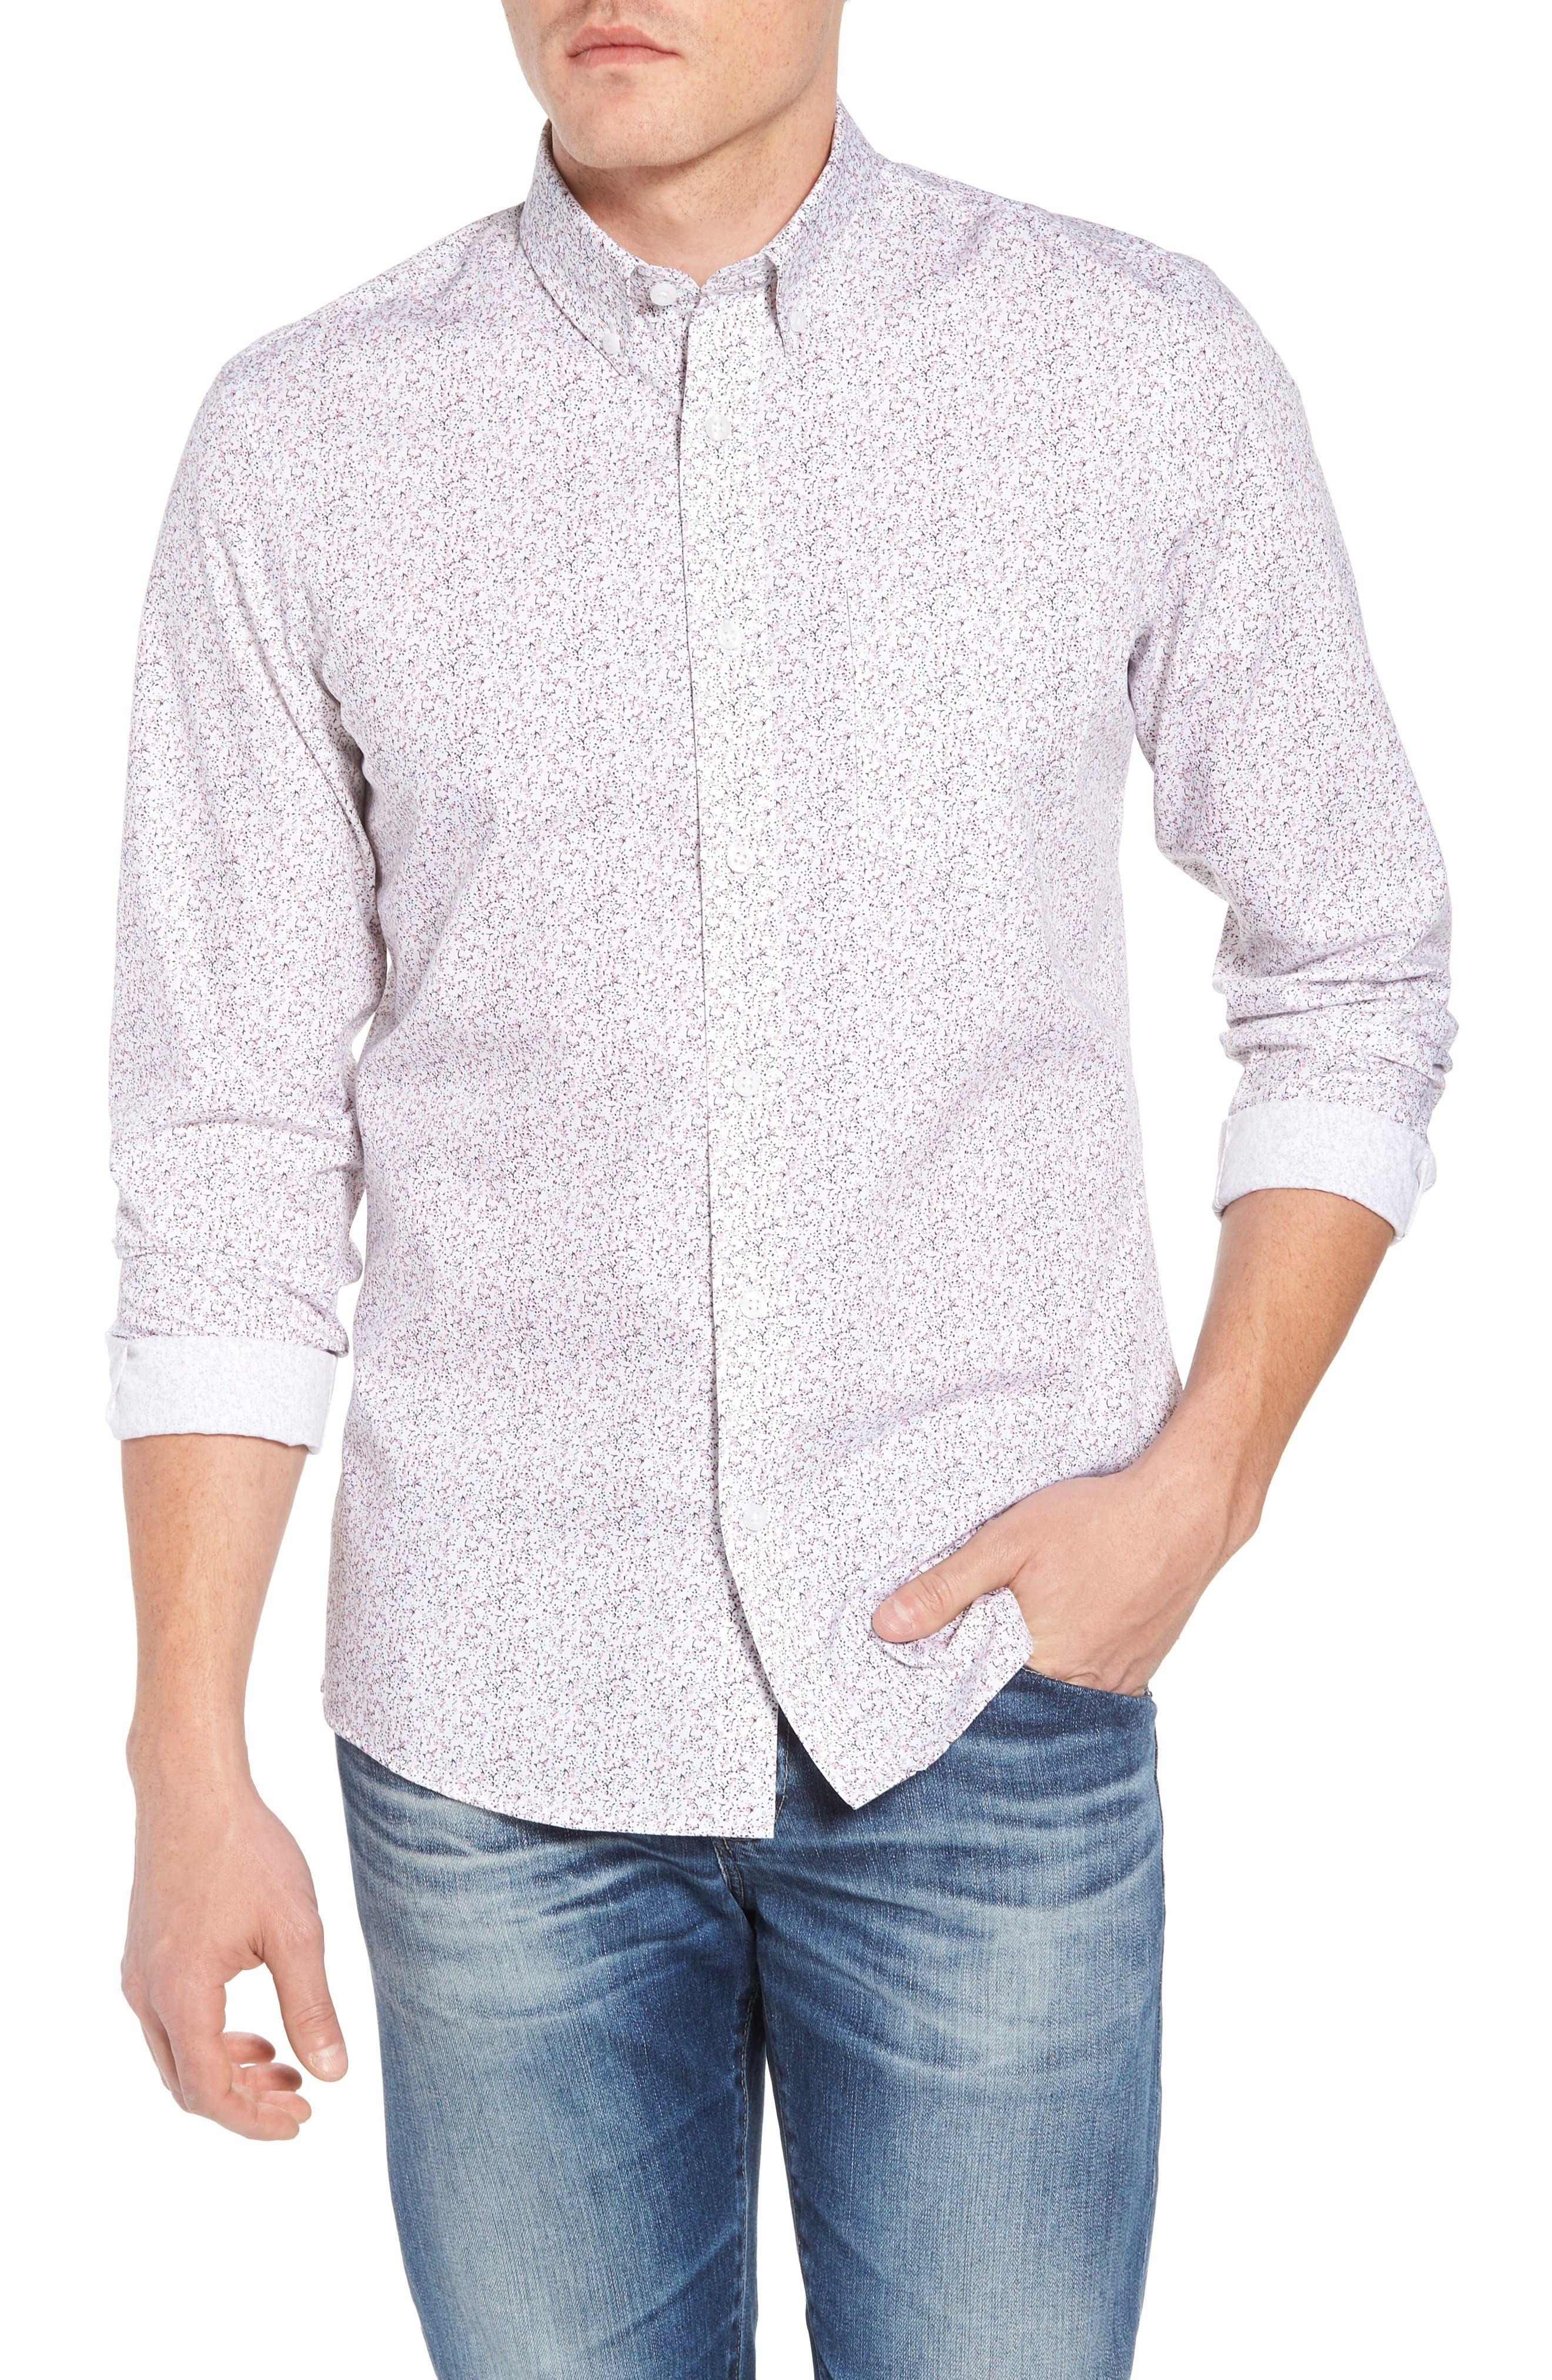 Trim Fit Print Sport Shirt,                         Main,                         color, WHITE NAVY SPRING FLORAL